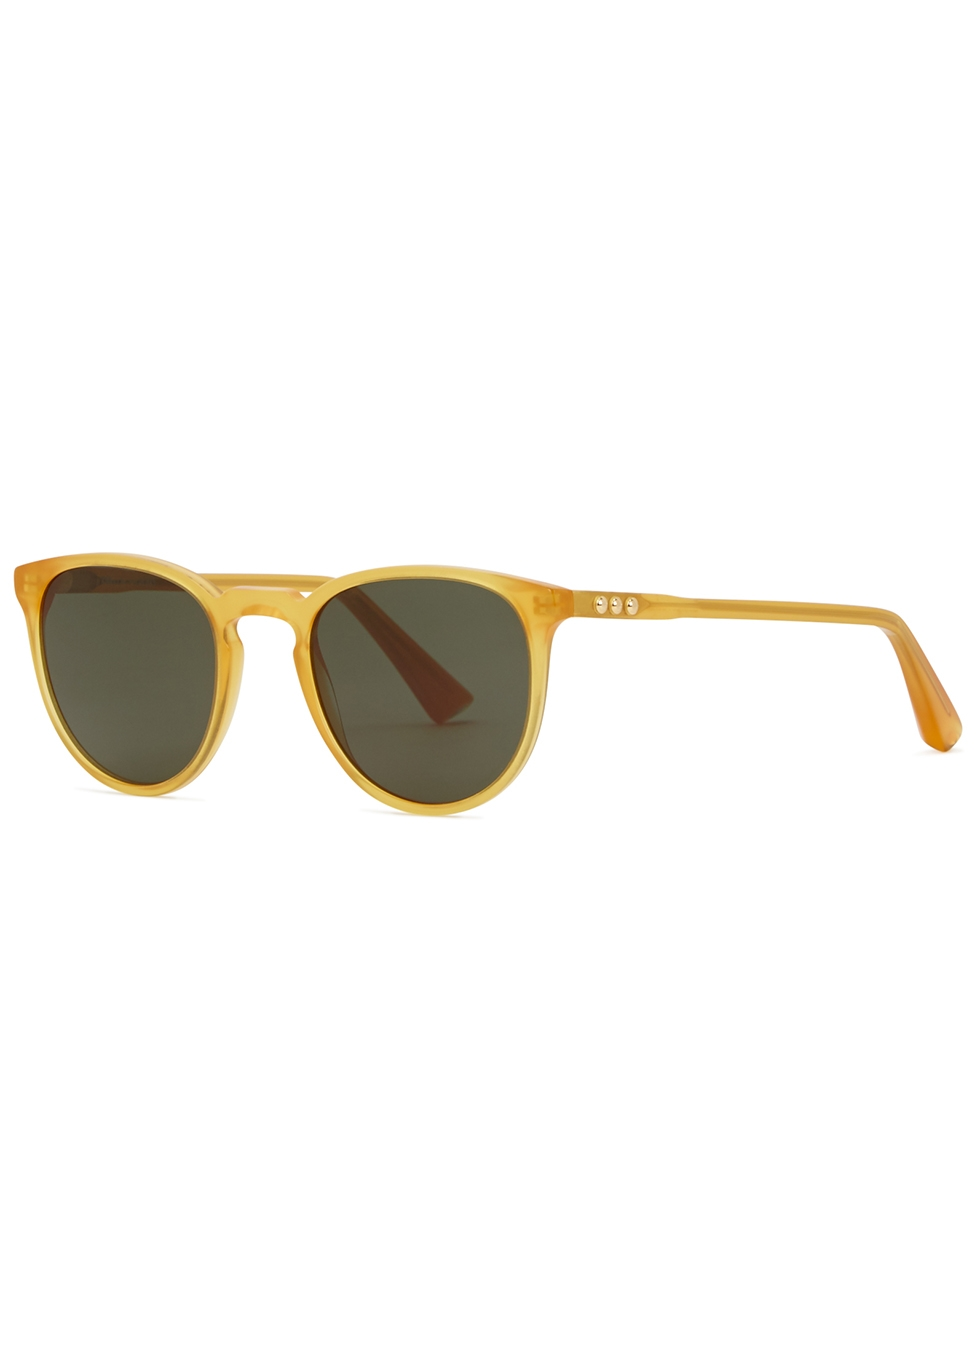 TAYLOR MORRIS EYEWEAR George Arthur C9 Round-Frame Sunglasses in Yellow